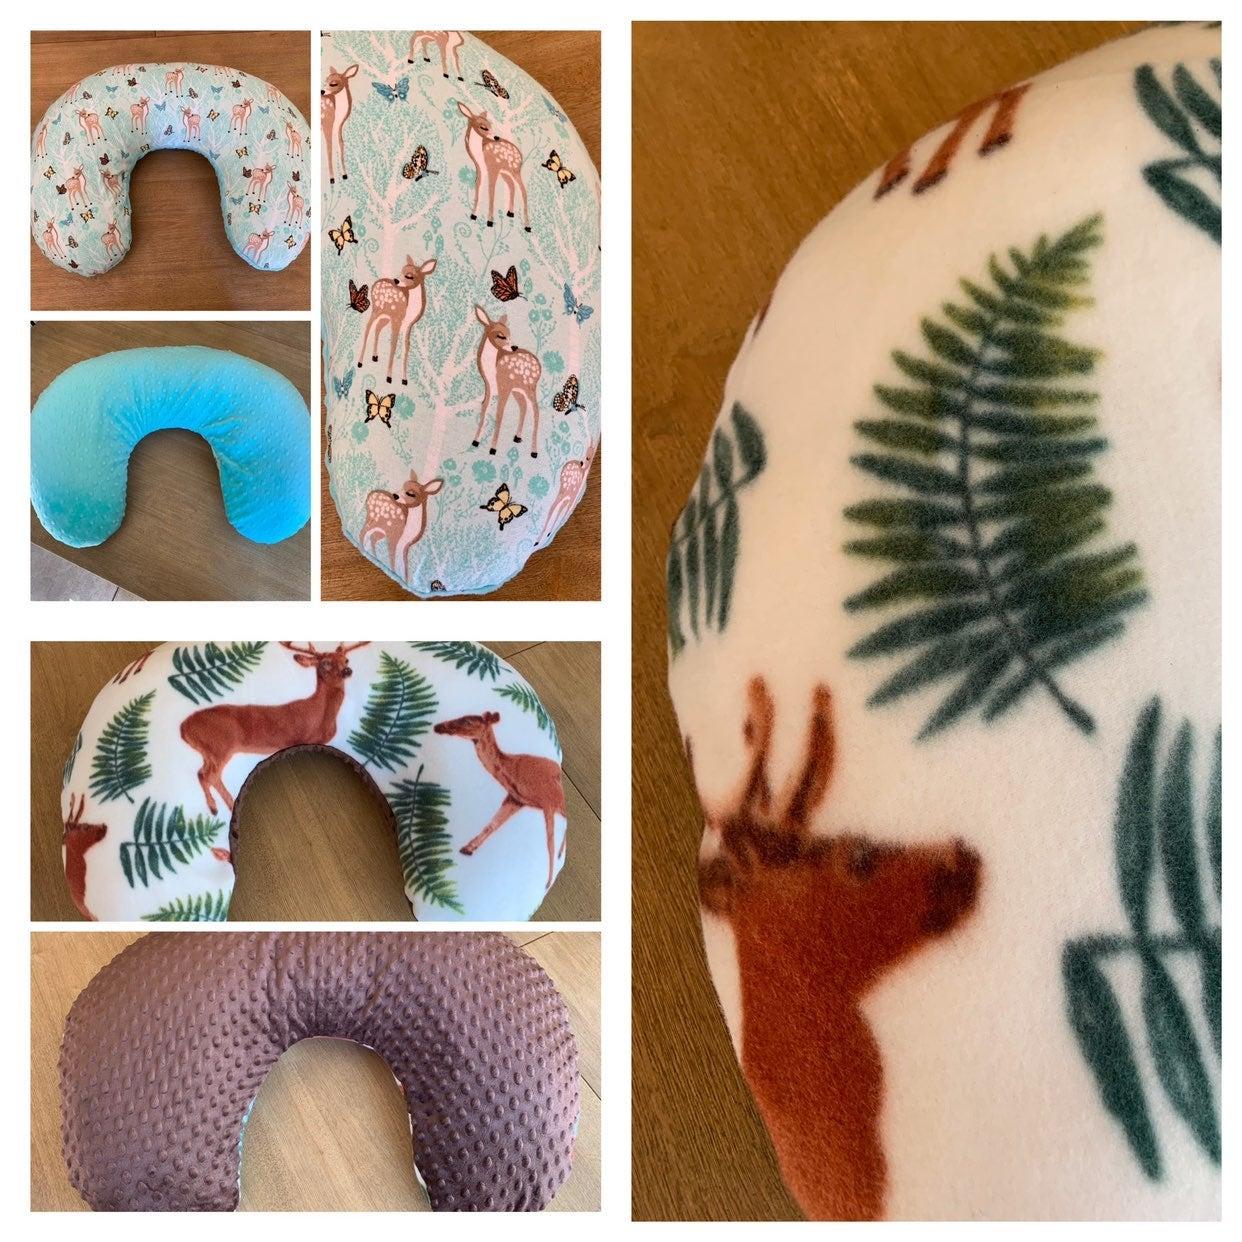 SALE Handmade Boppy Pillow Covers